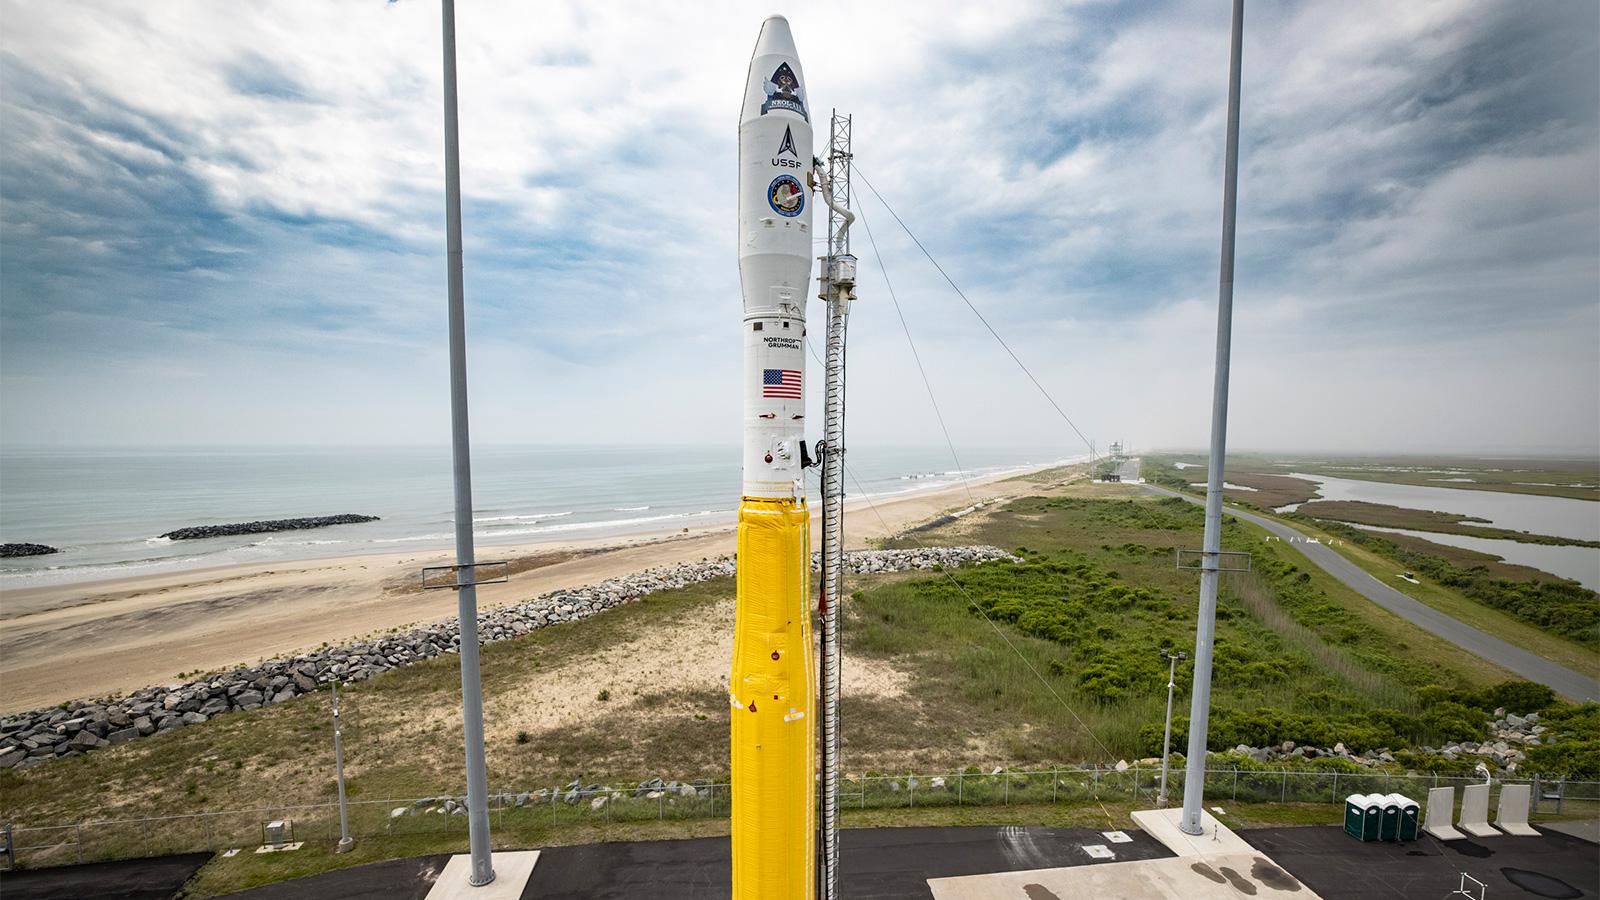 Catch Northrop Grumman's Minotaur 1 rocket launch into orbit Tuesday morning